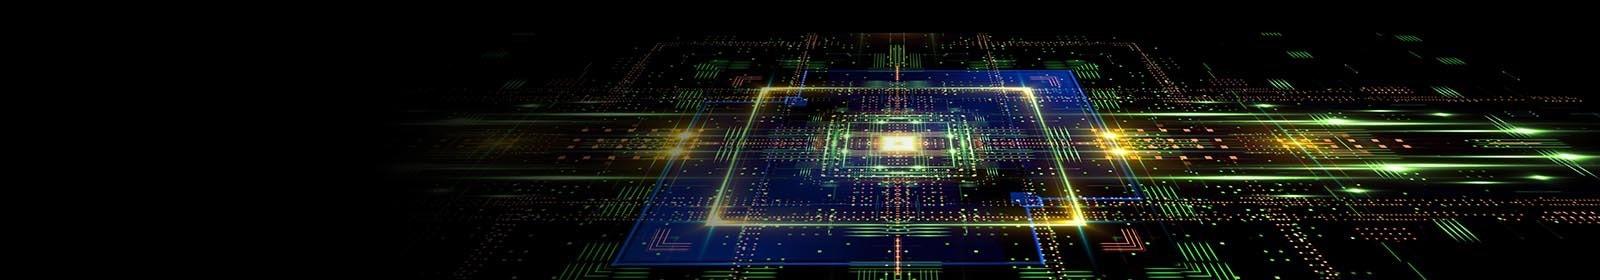 Image of a glowing circuit board